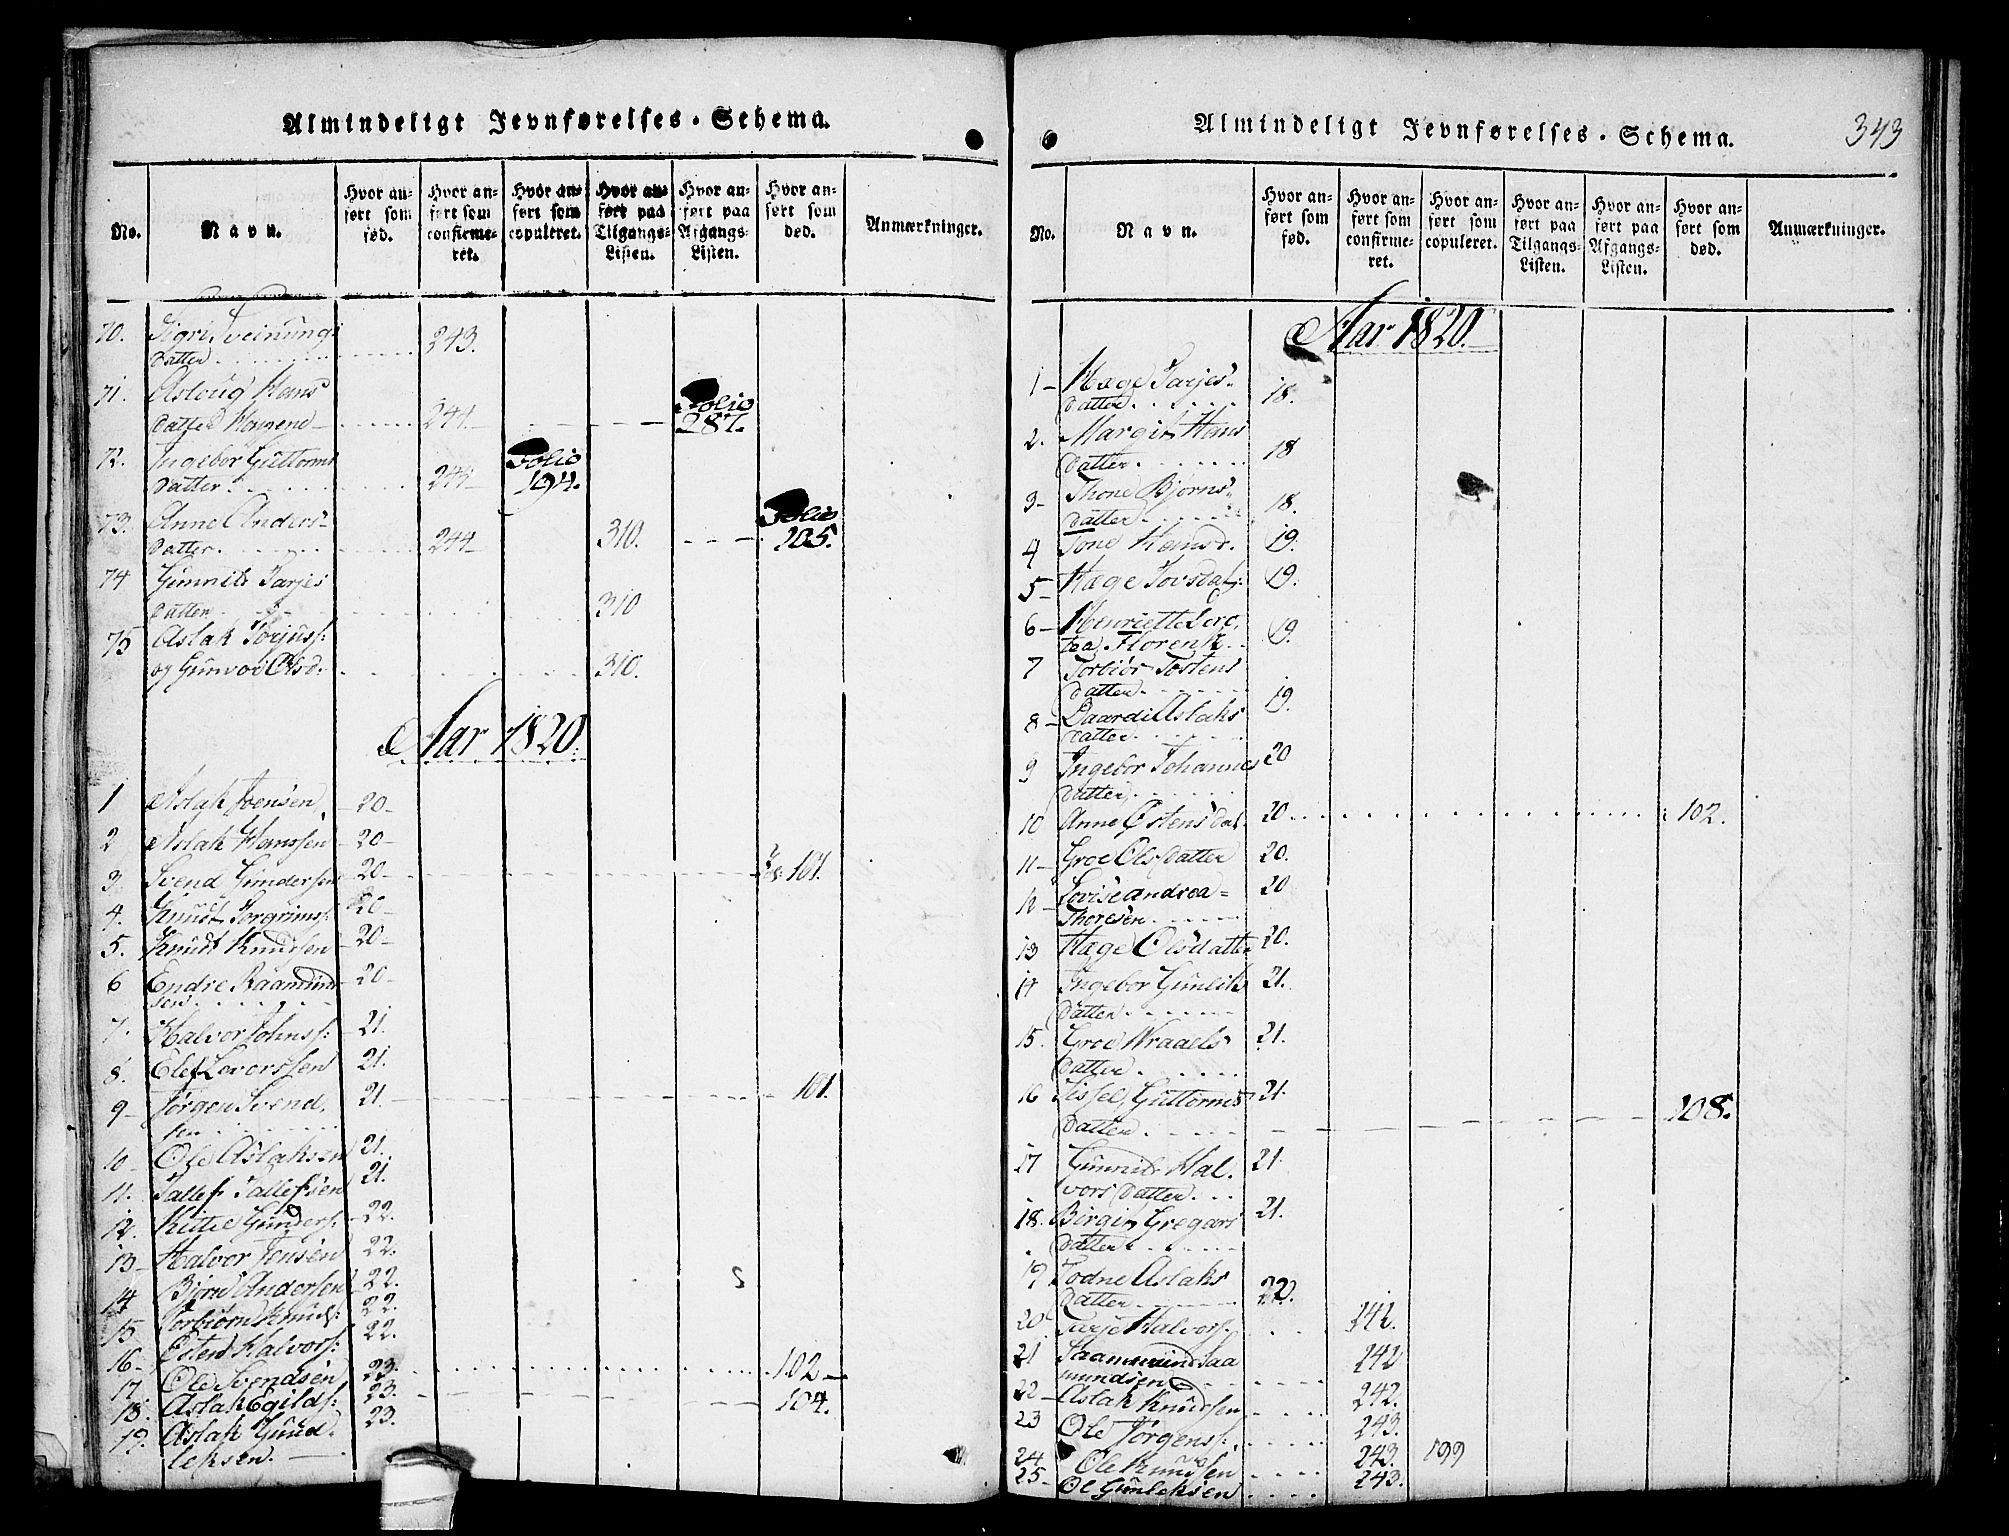 SAKO, Kviteseid kirkebøker, F/Fb/L0001: Ministerialbok nr. II 1, 1815-1836, s. 343